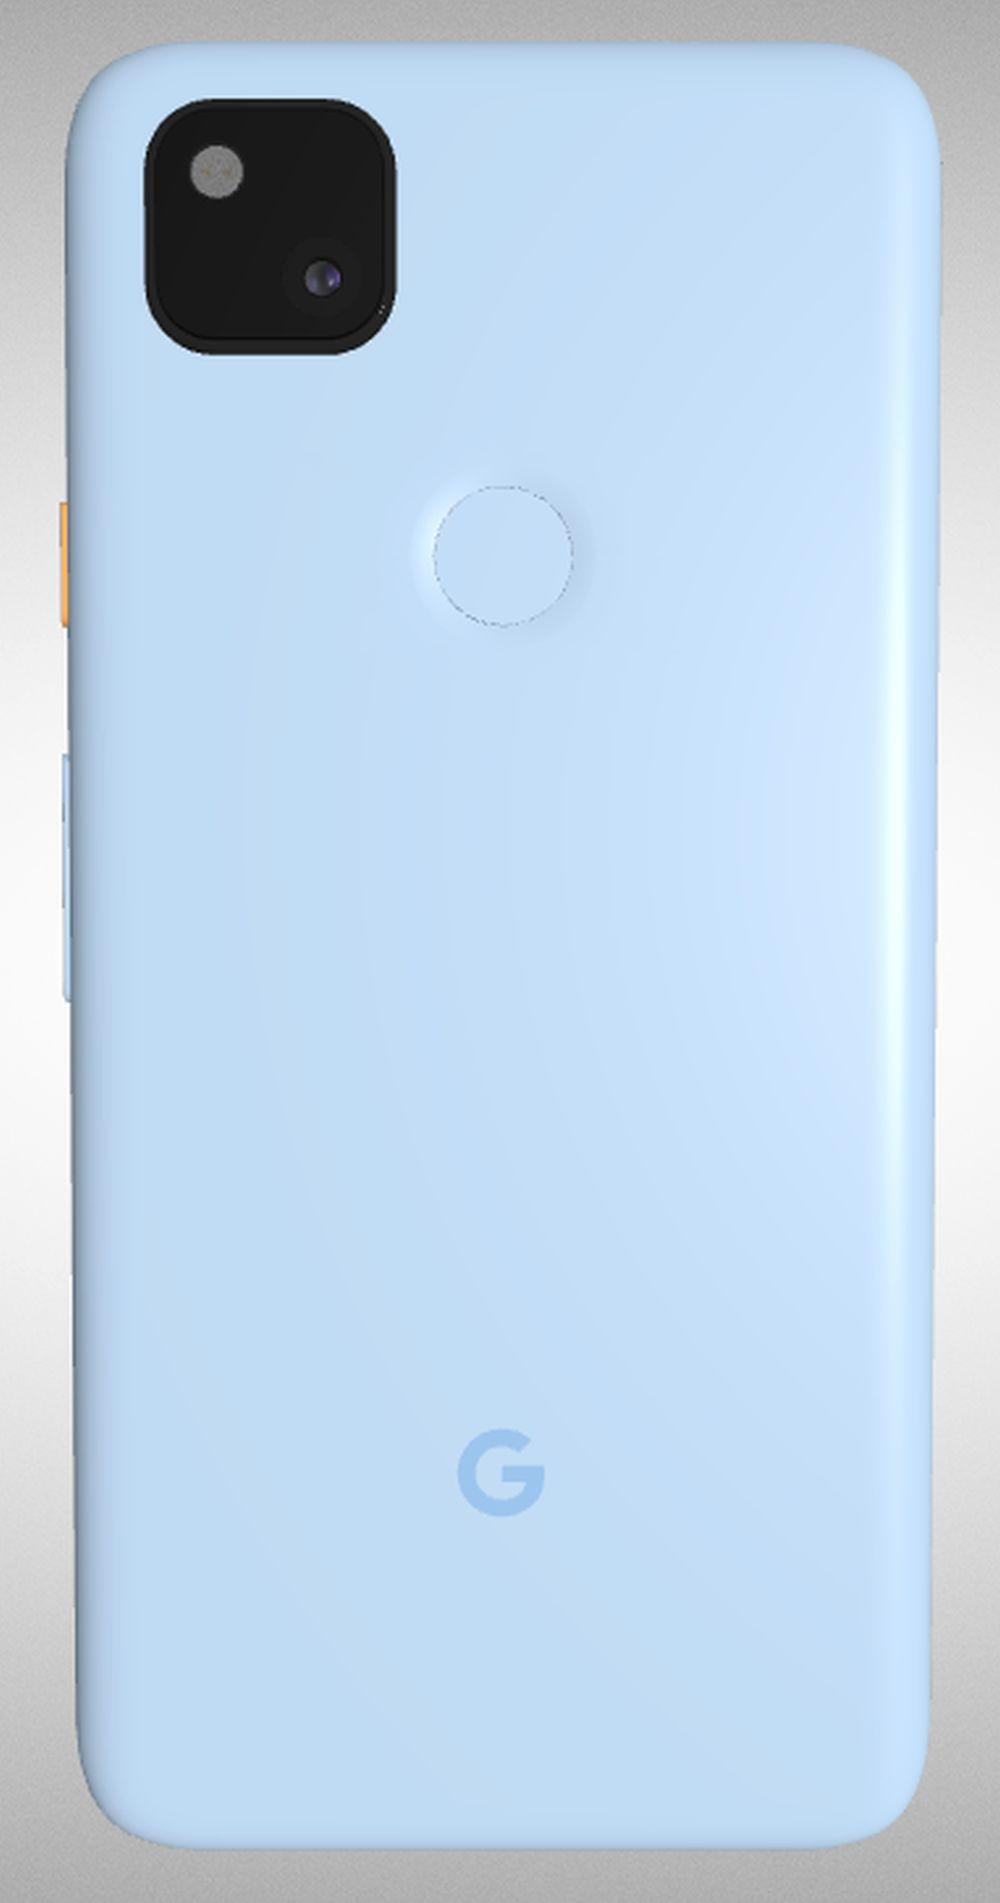 pixel 4a in blau back